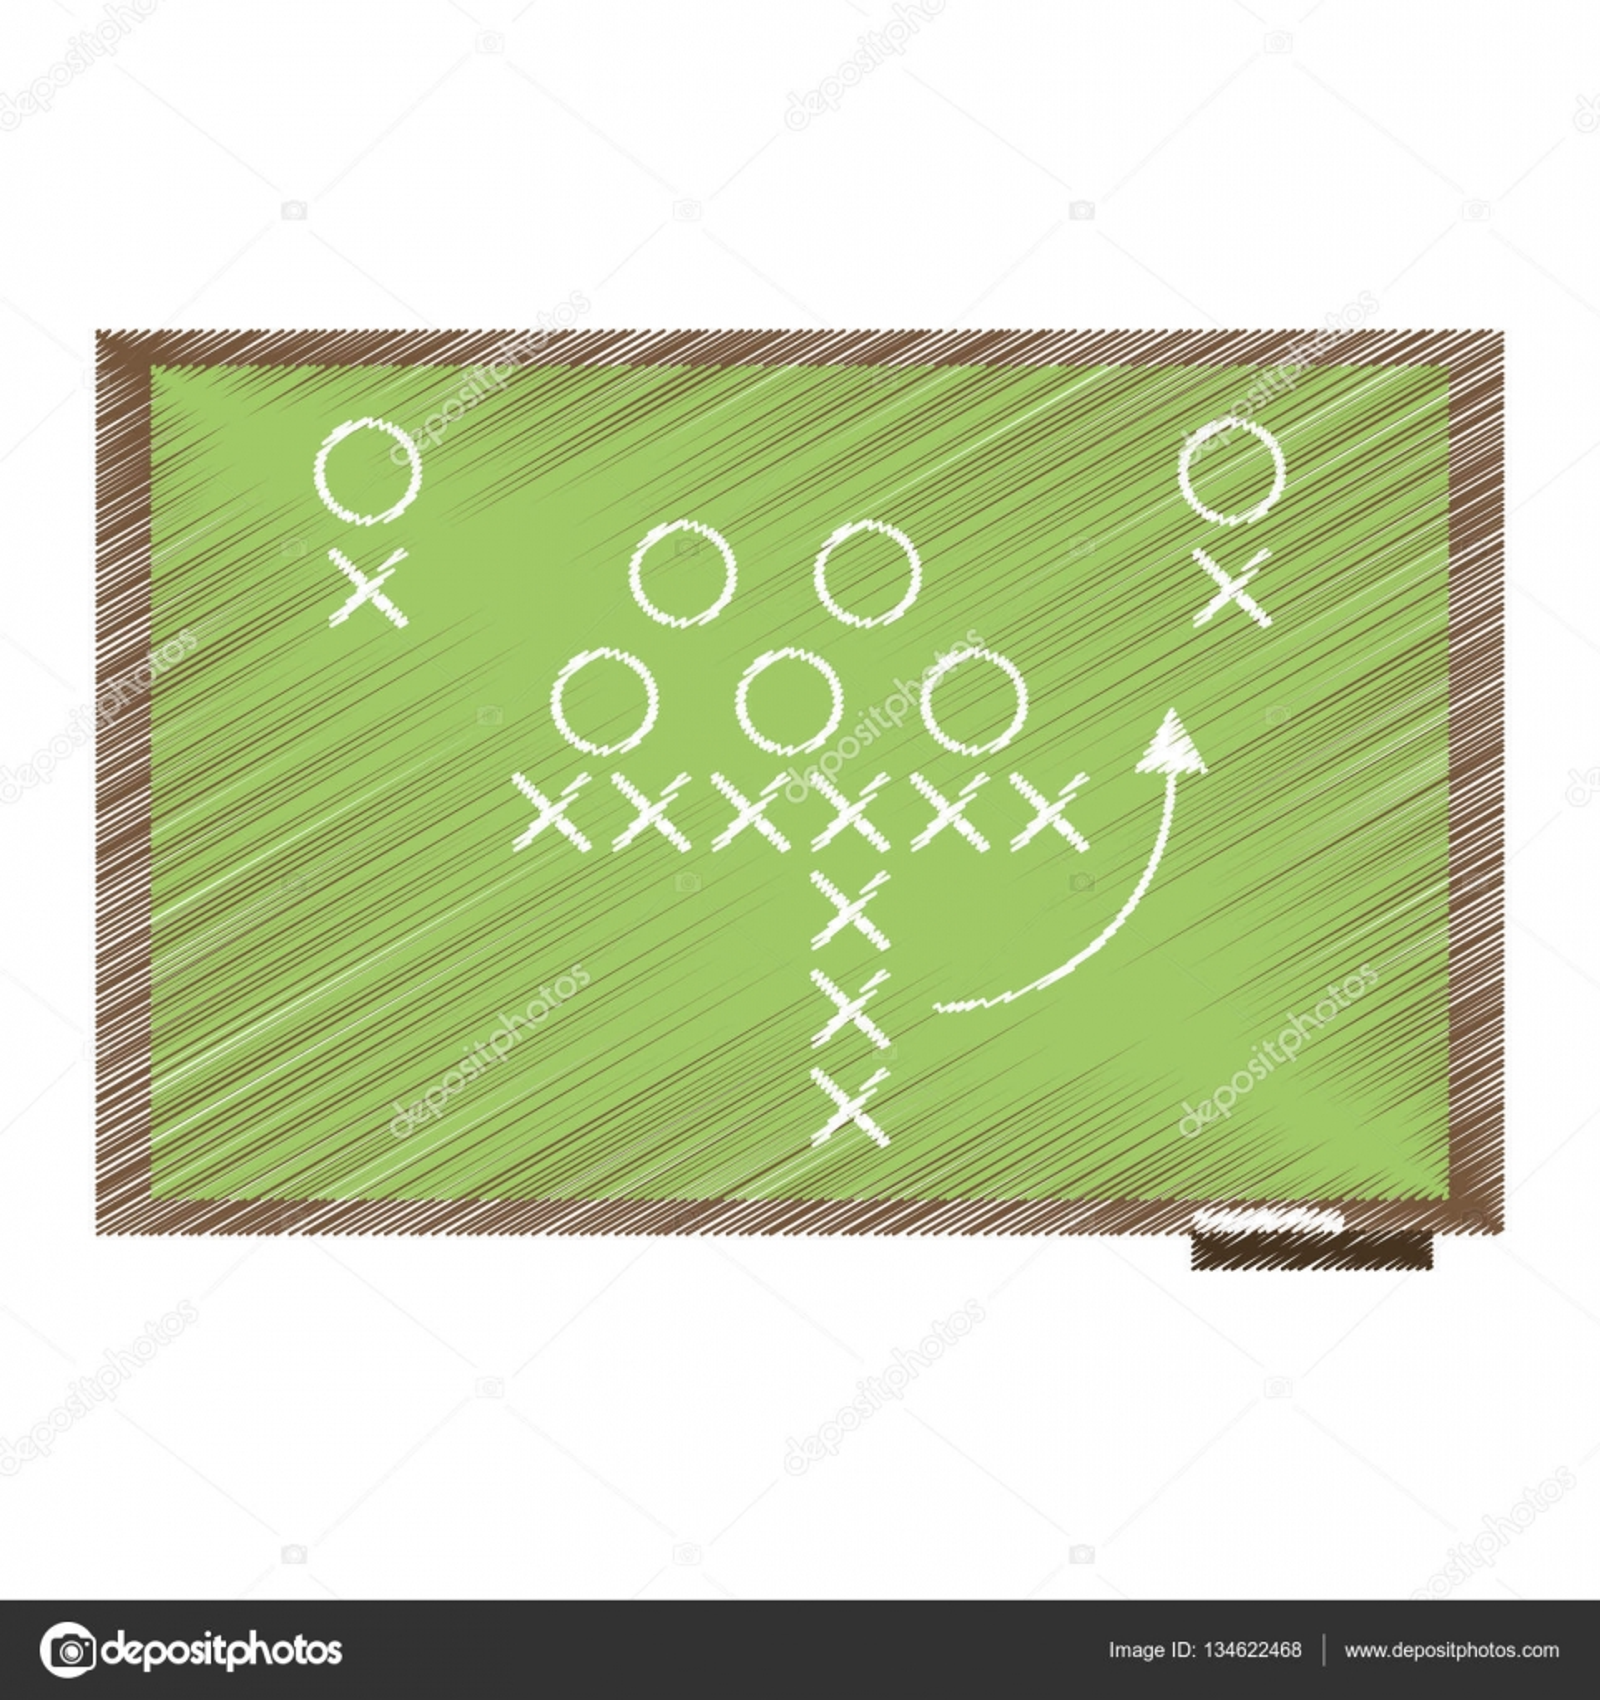 Drawing sport tactics chalkboard american football stock vector drawing sport tactics chalkboard american football stock vector biocorpaavc